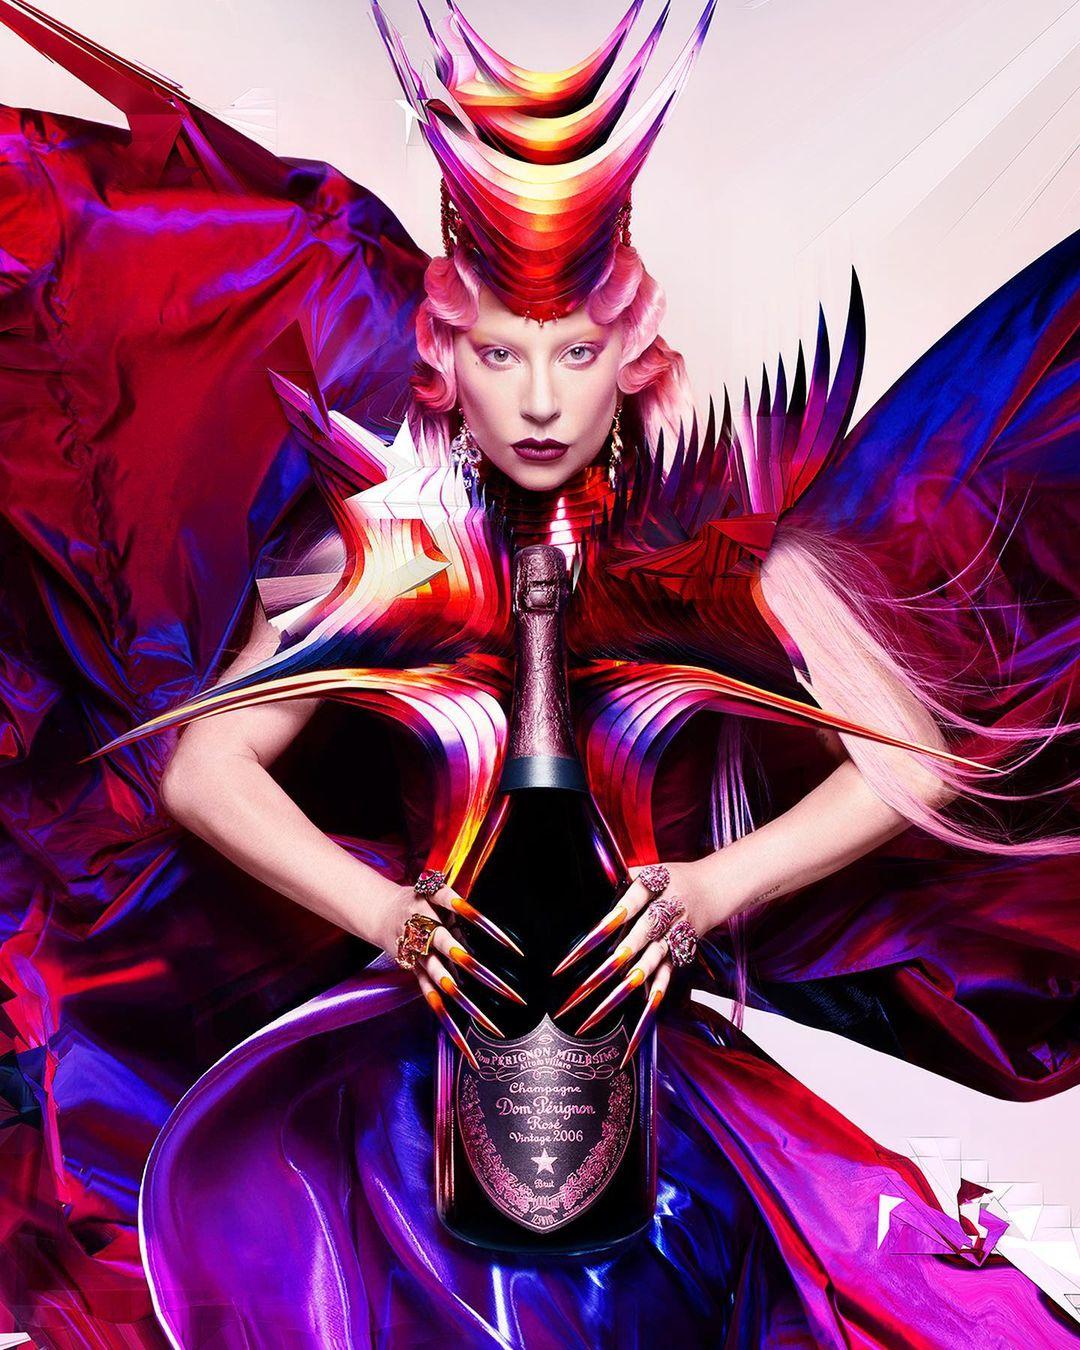 Lady Gaga in a dress by Miodrag Guberinic